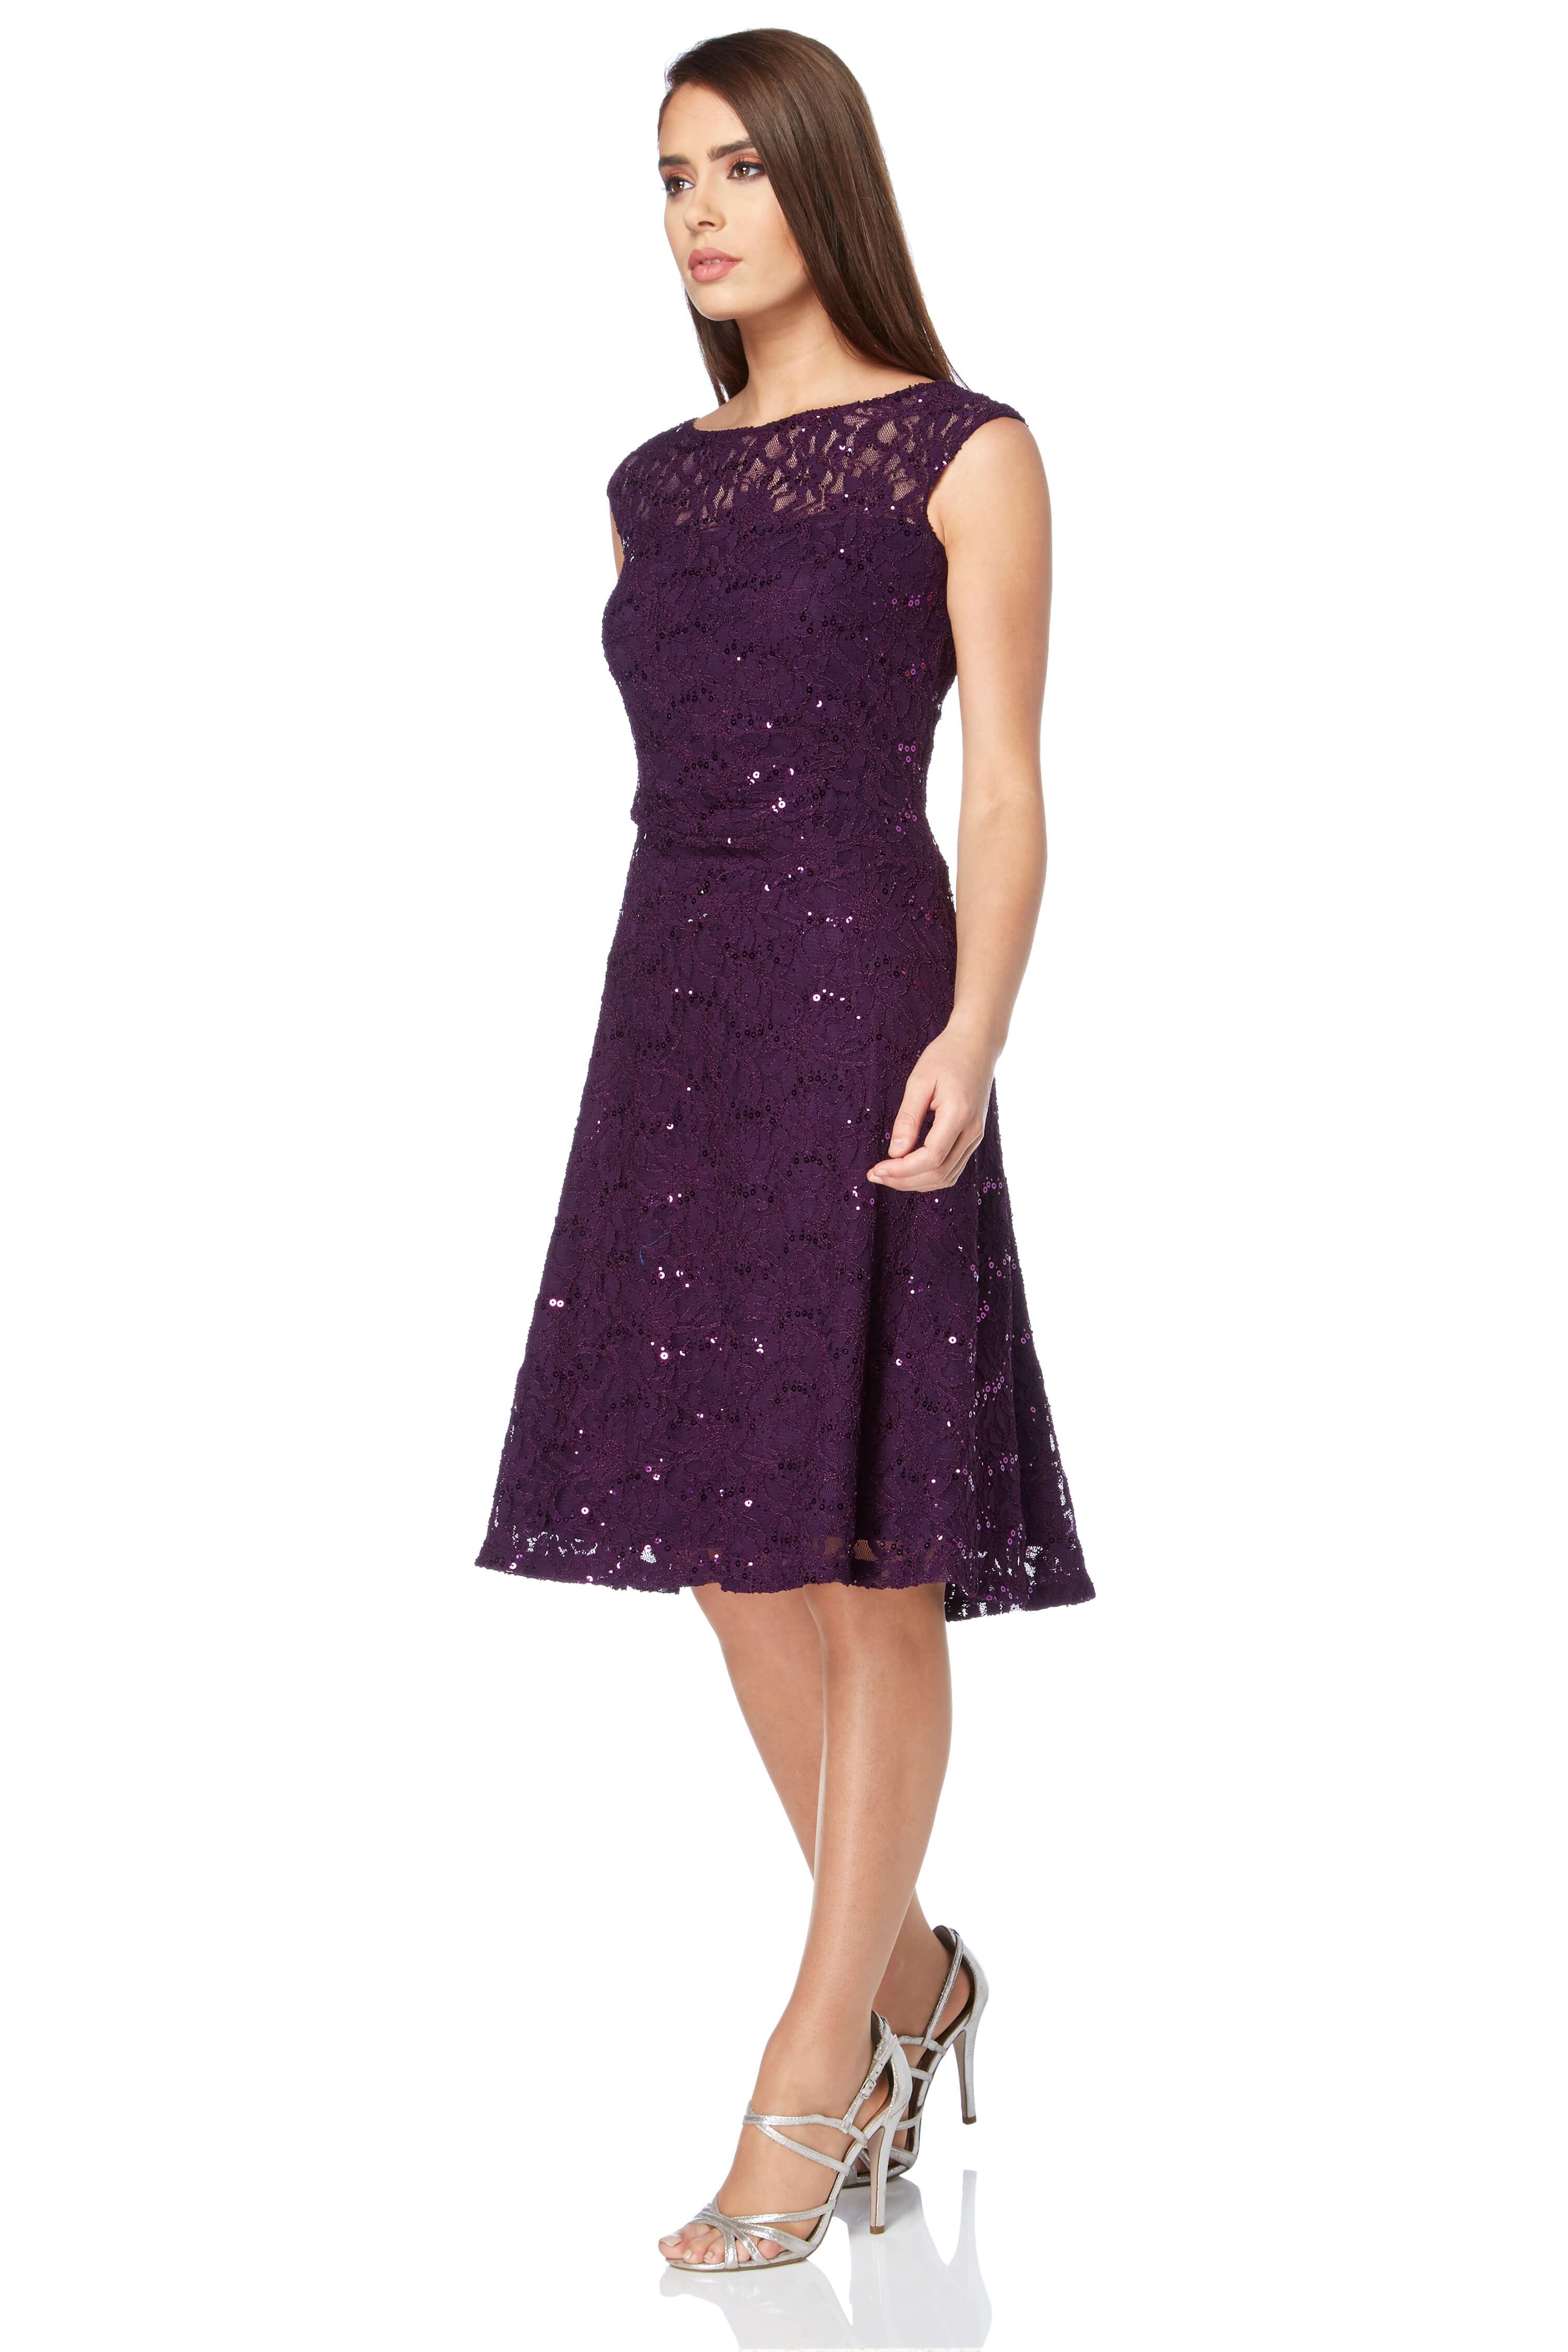 Roman-Originals-Ladies-Lace-Fit-and-Flare-Dress-Purple thumbnail 18